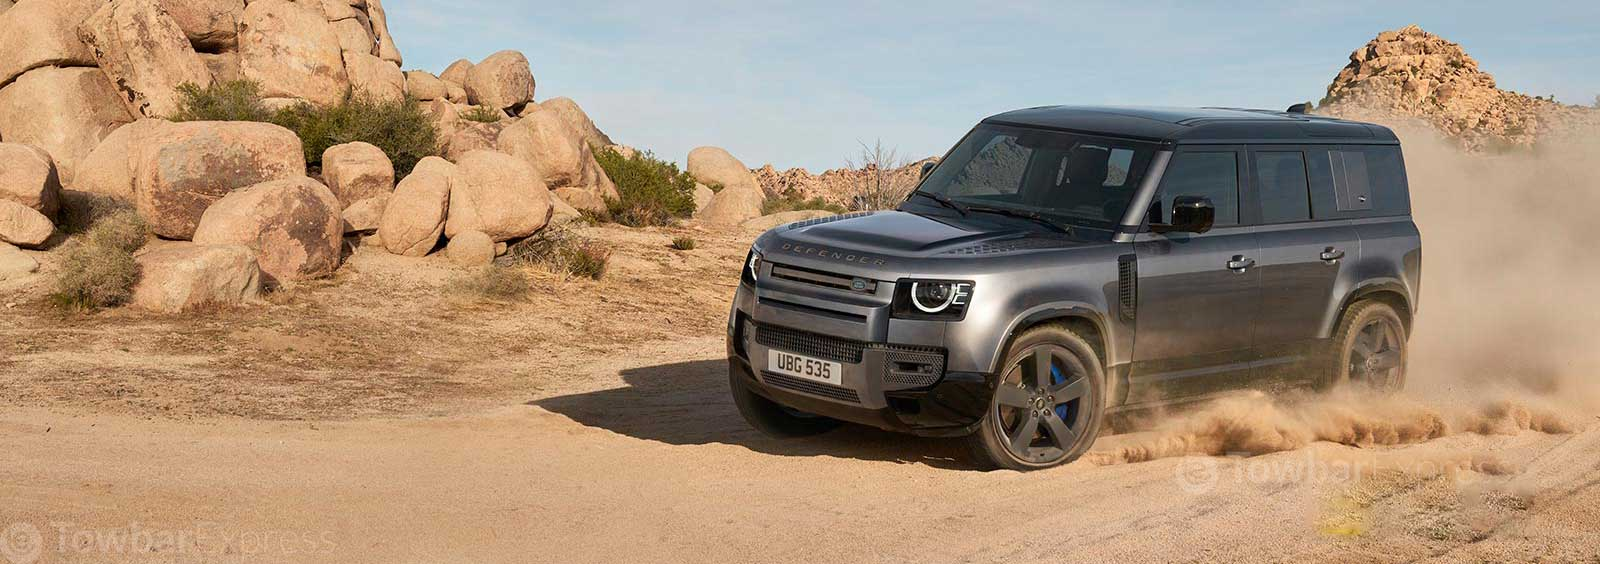 Land Rover Defender Towbar